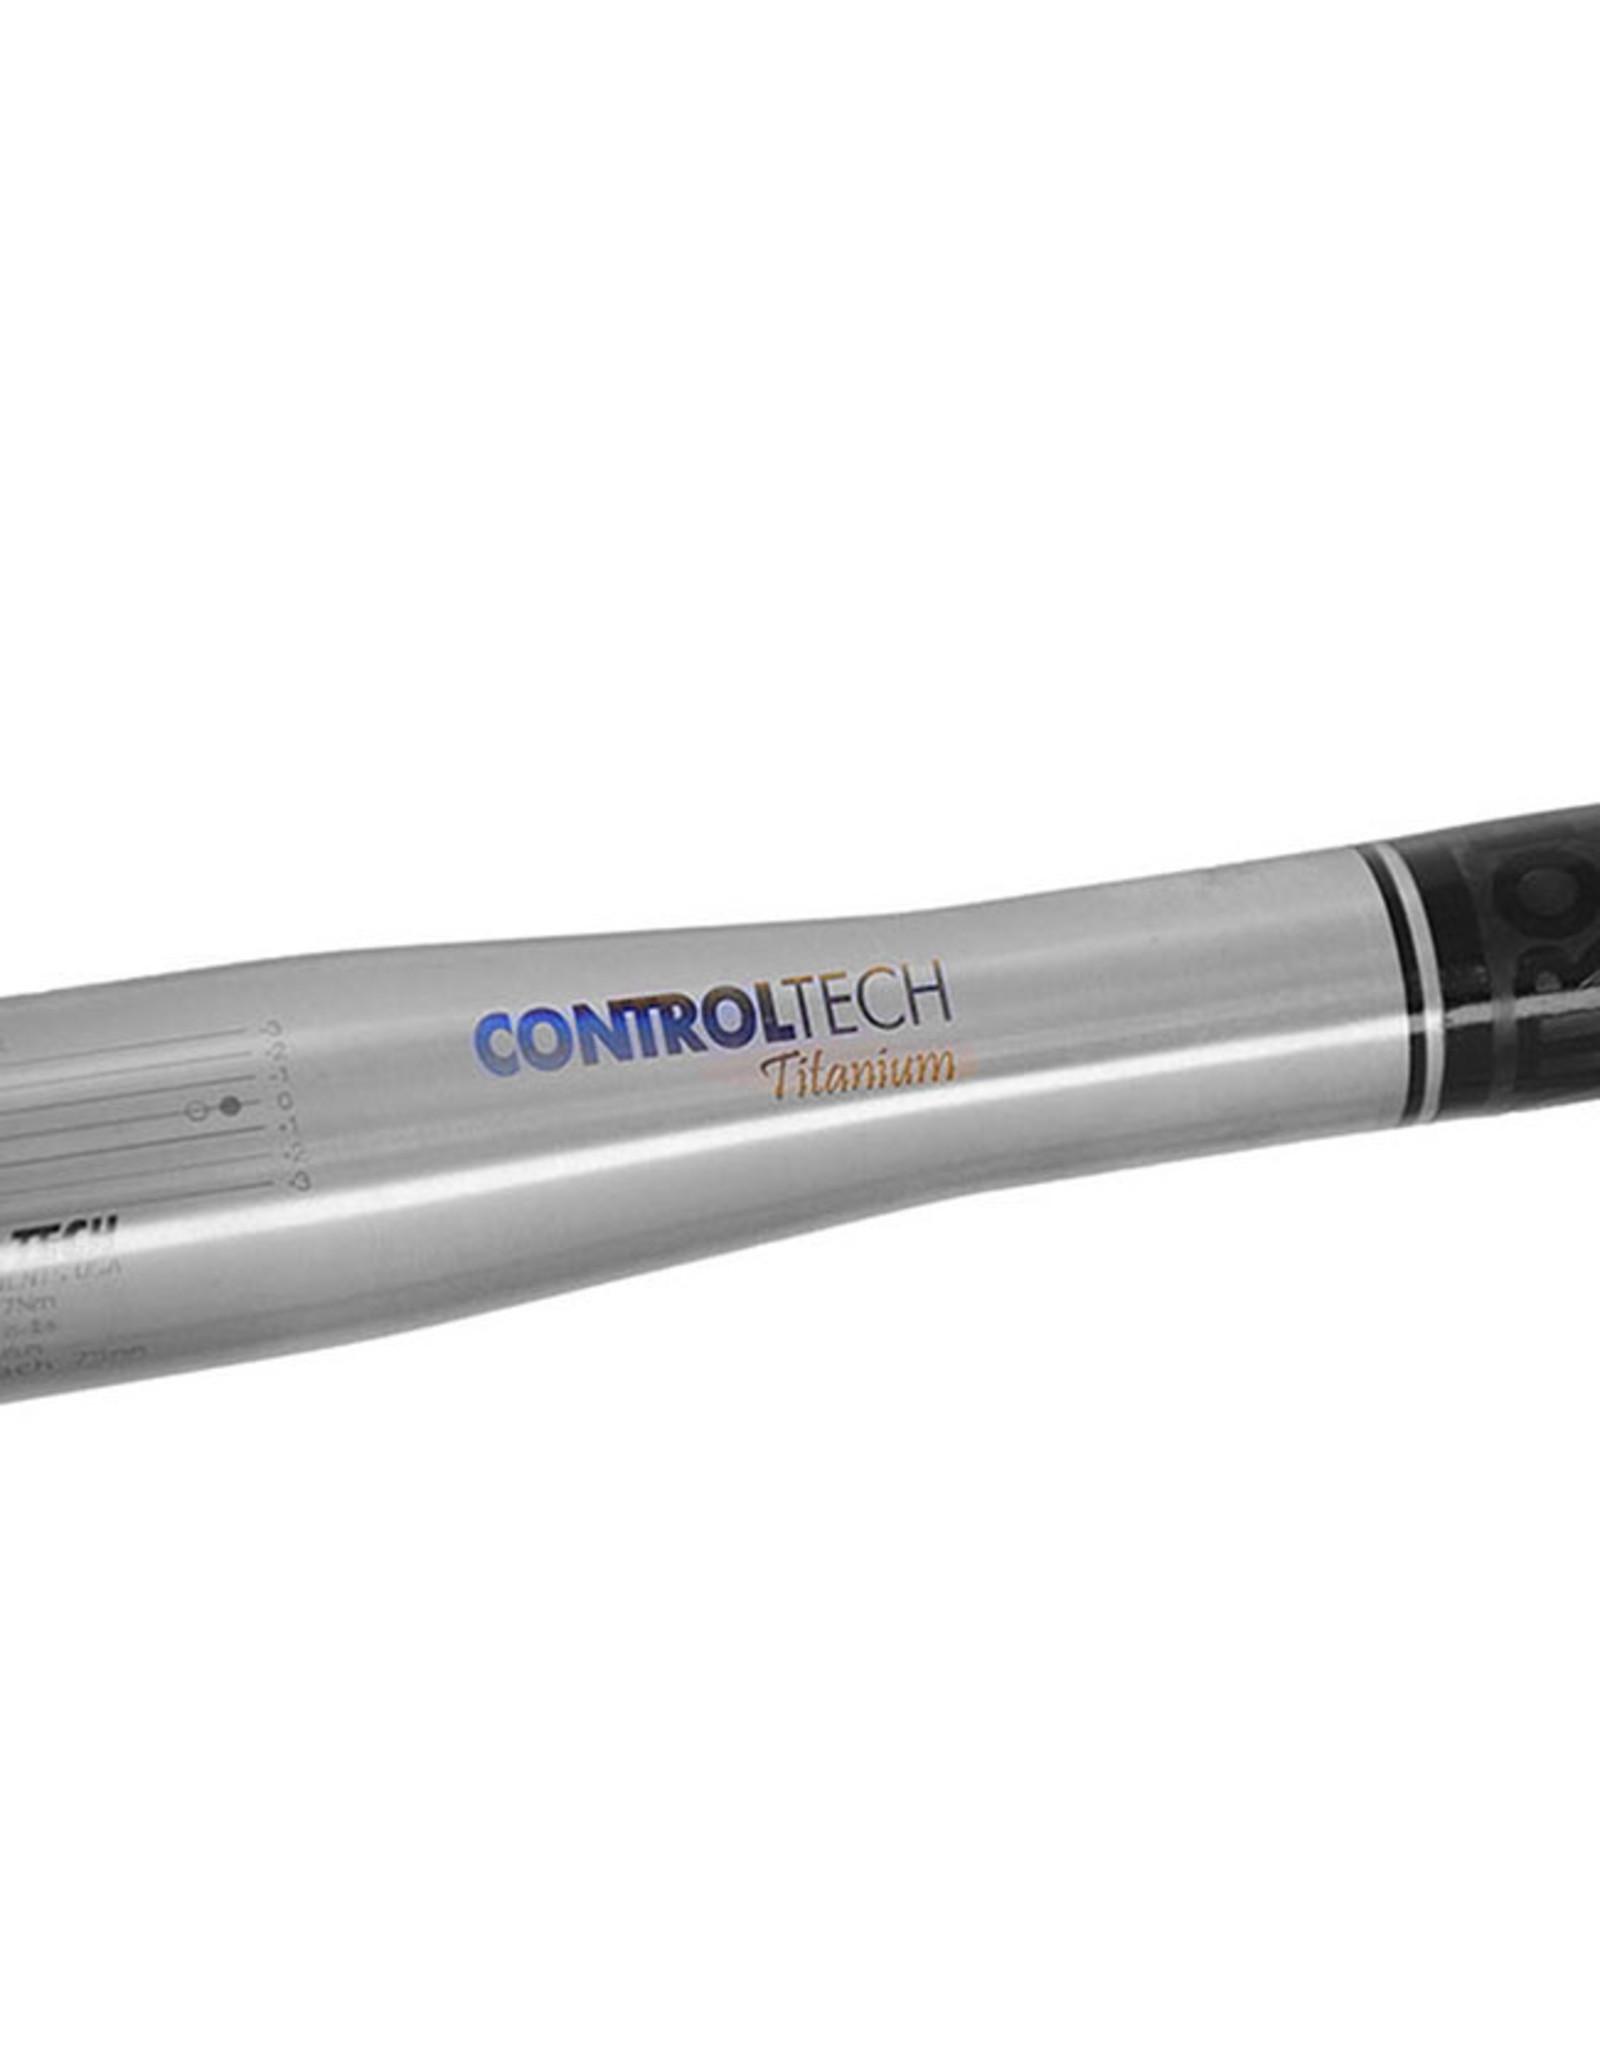 ControlTech ControlTech TiMania Titanium Road Handlebar